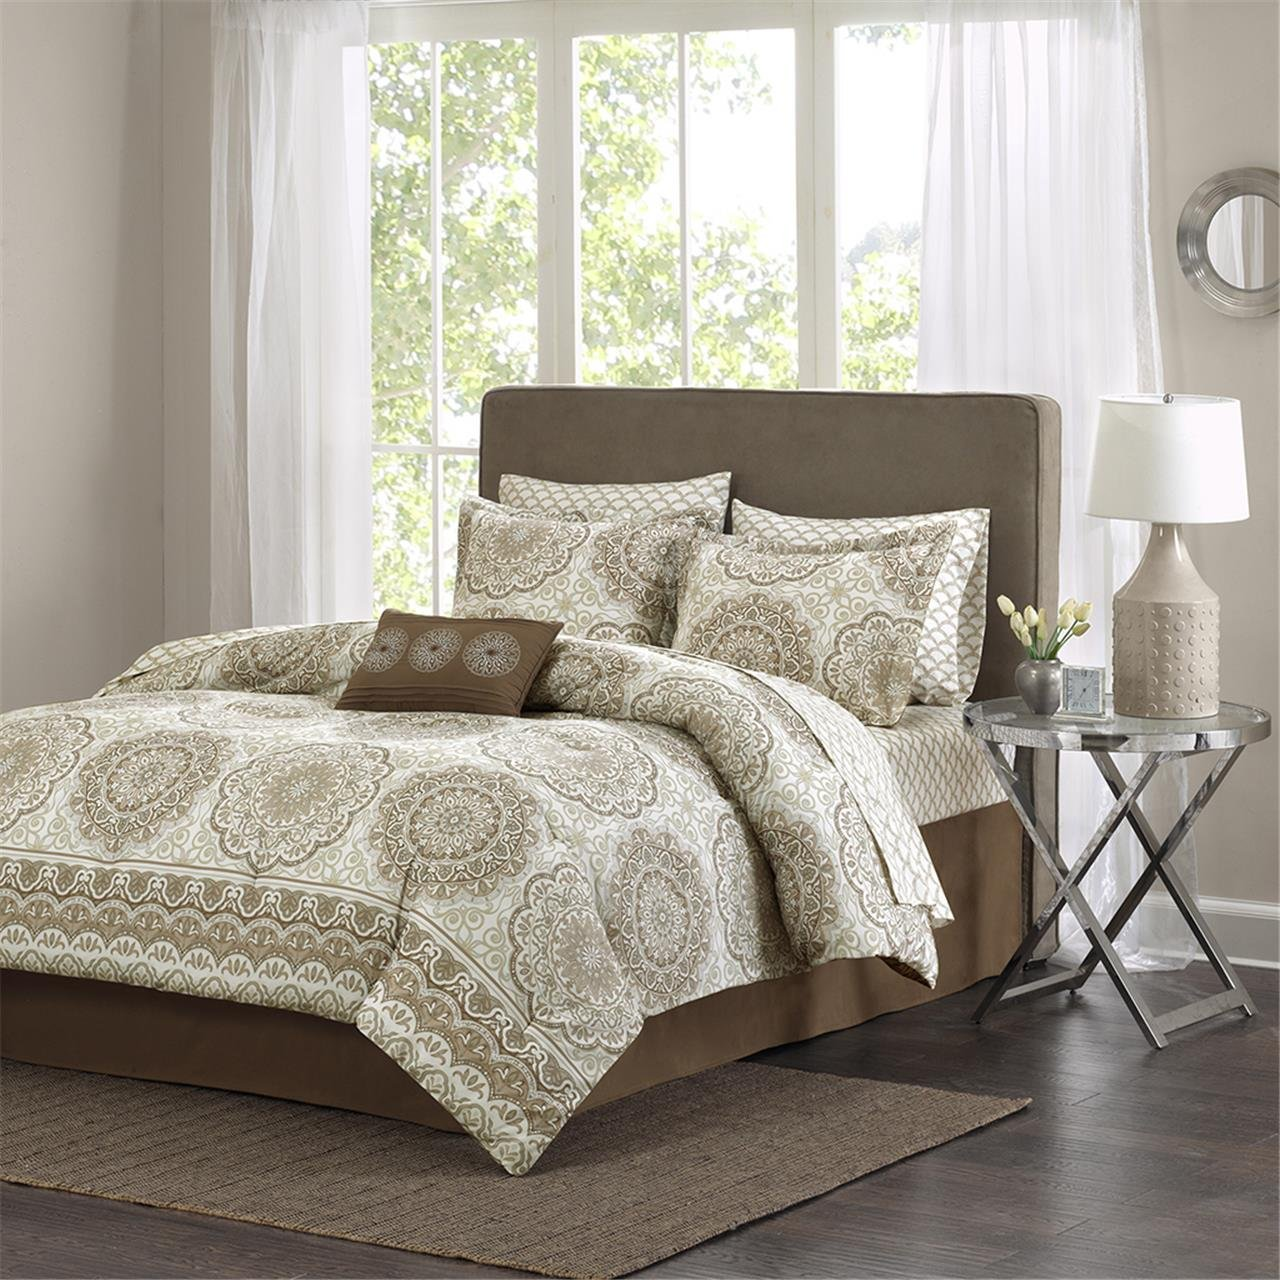 mpe10096 madison park essentials coronado complete bed u0026 sheet set